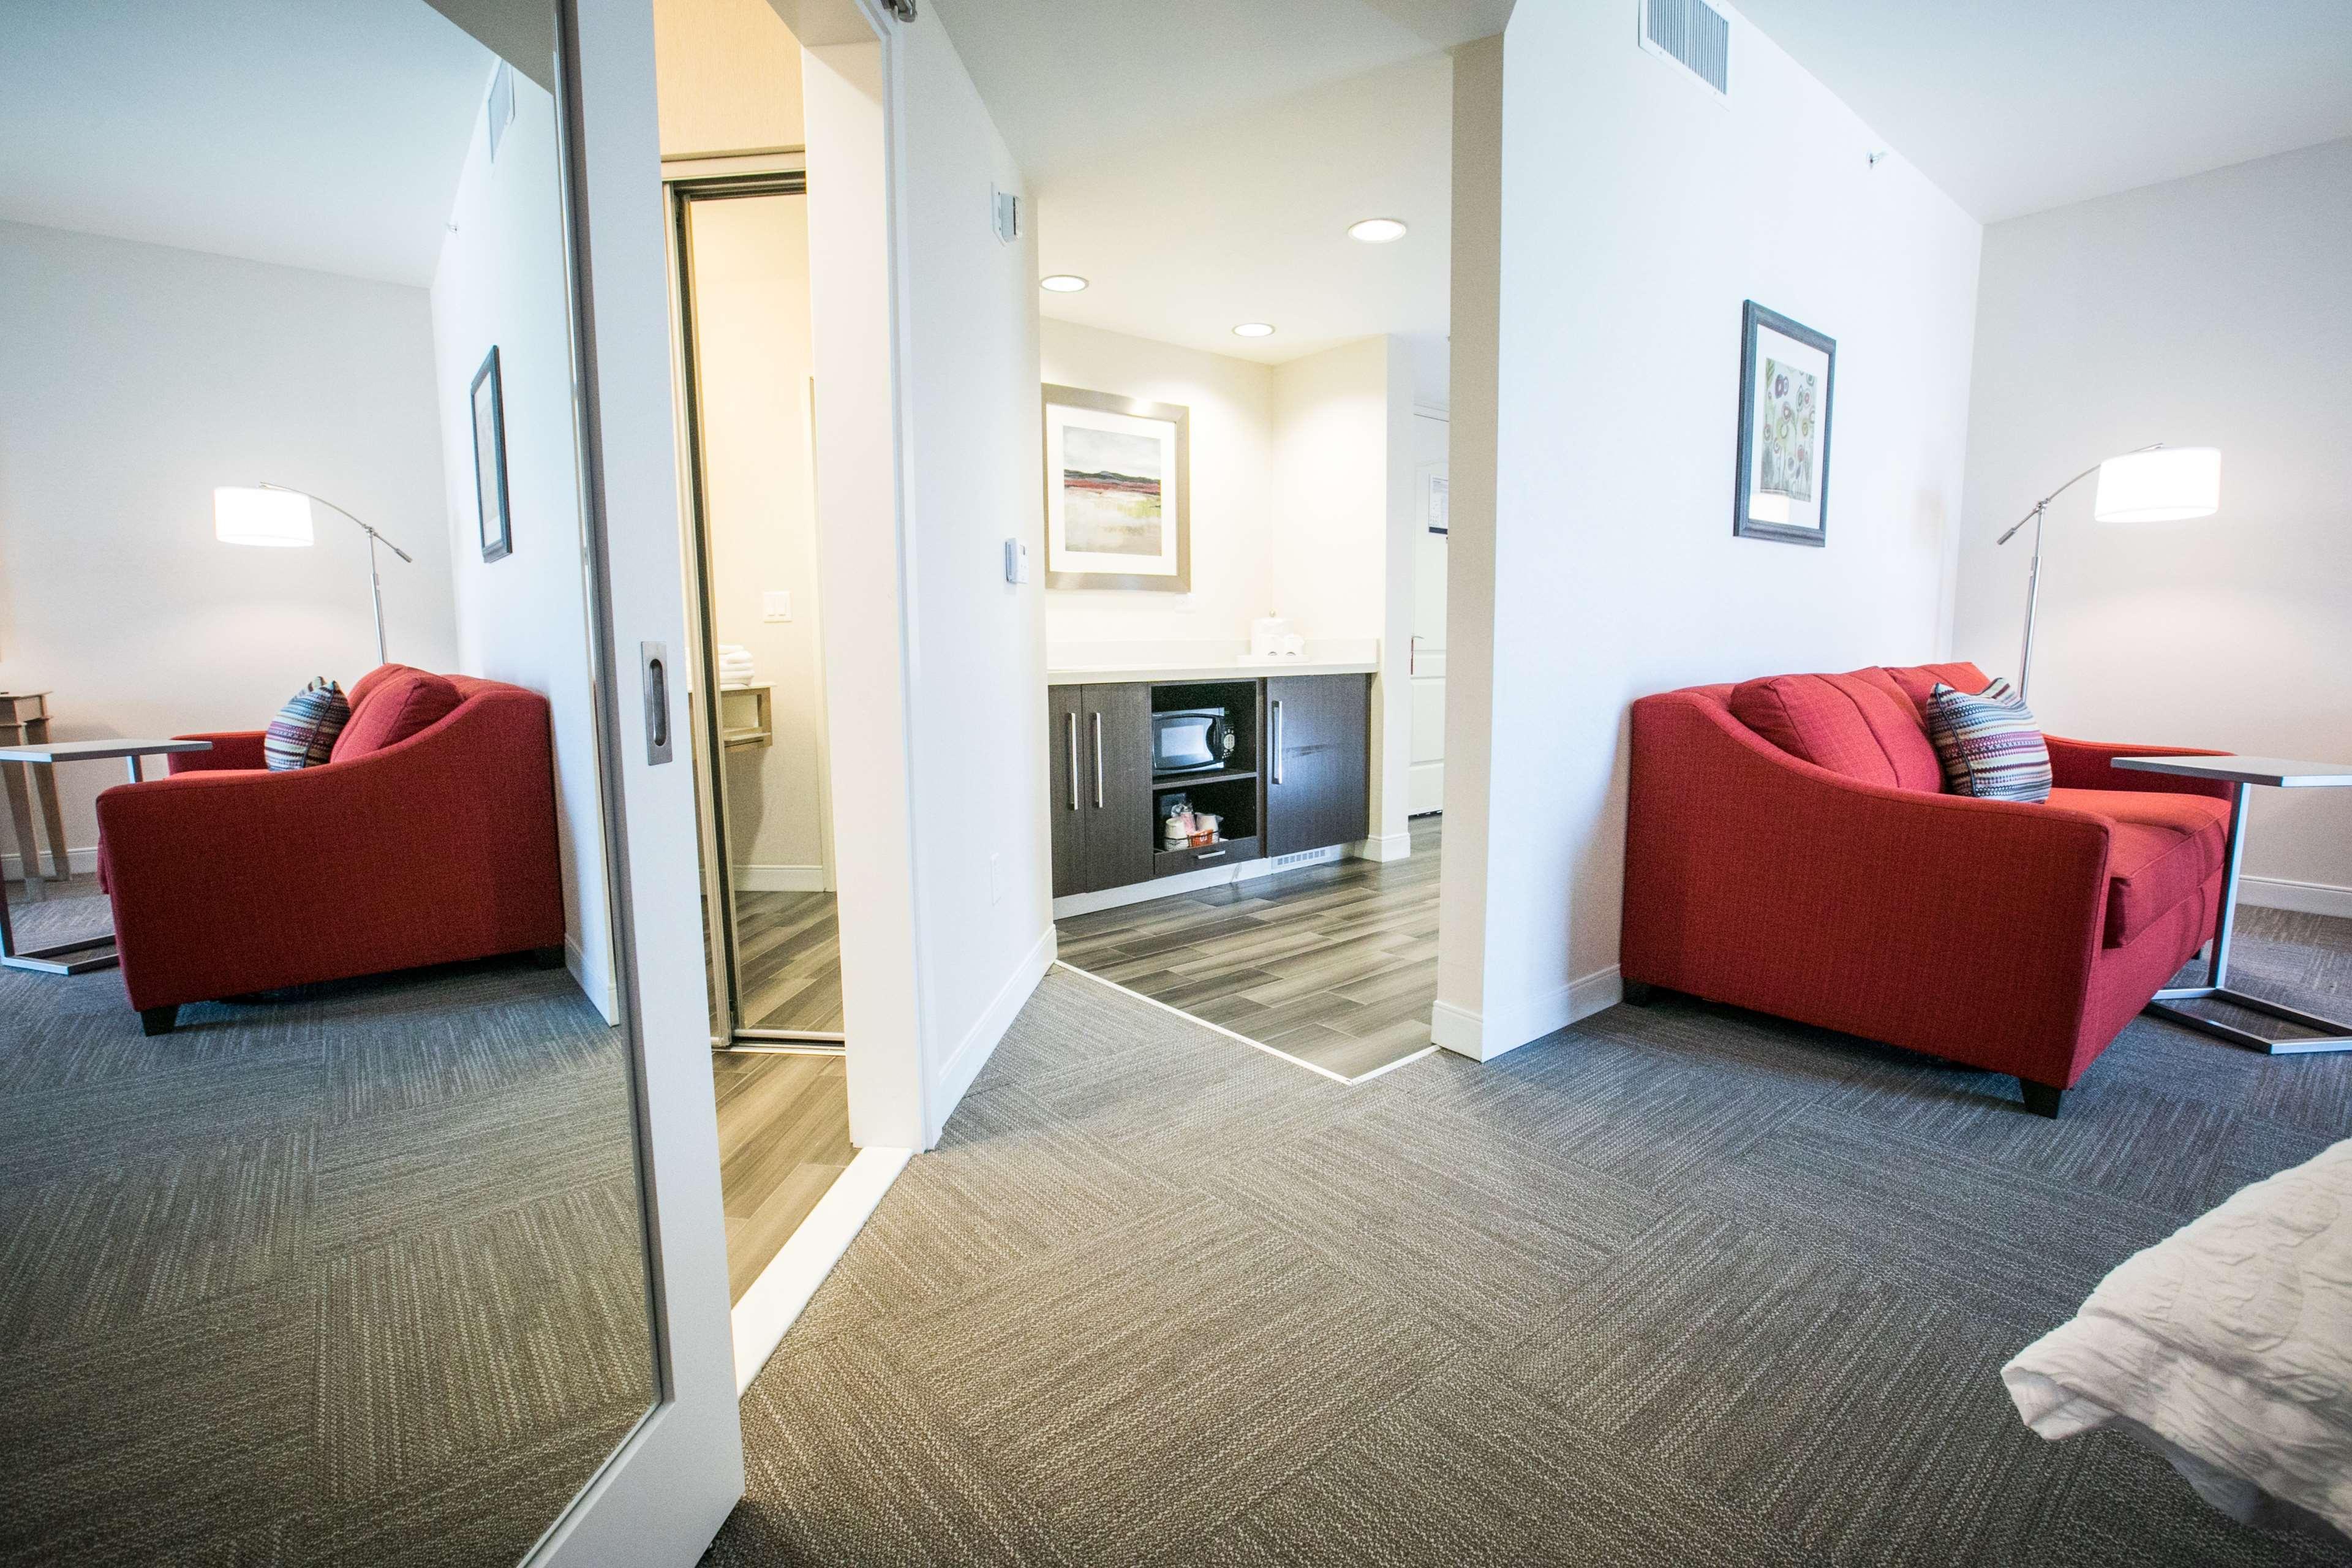 Hampton Inn & Suites Tempe - Phoenix Airport image 27